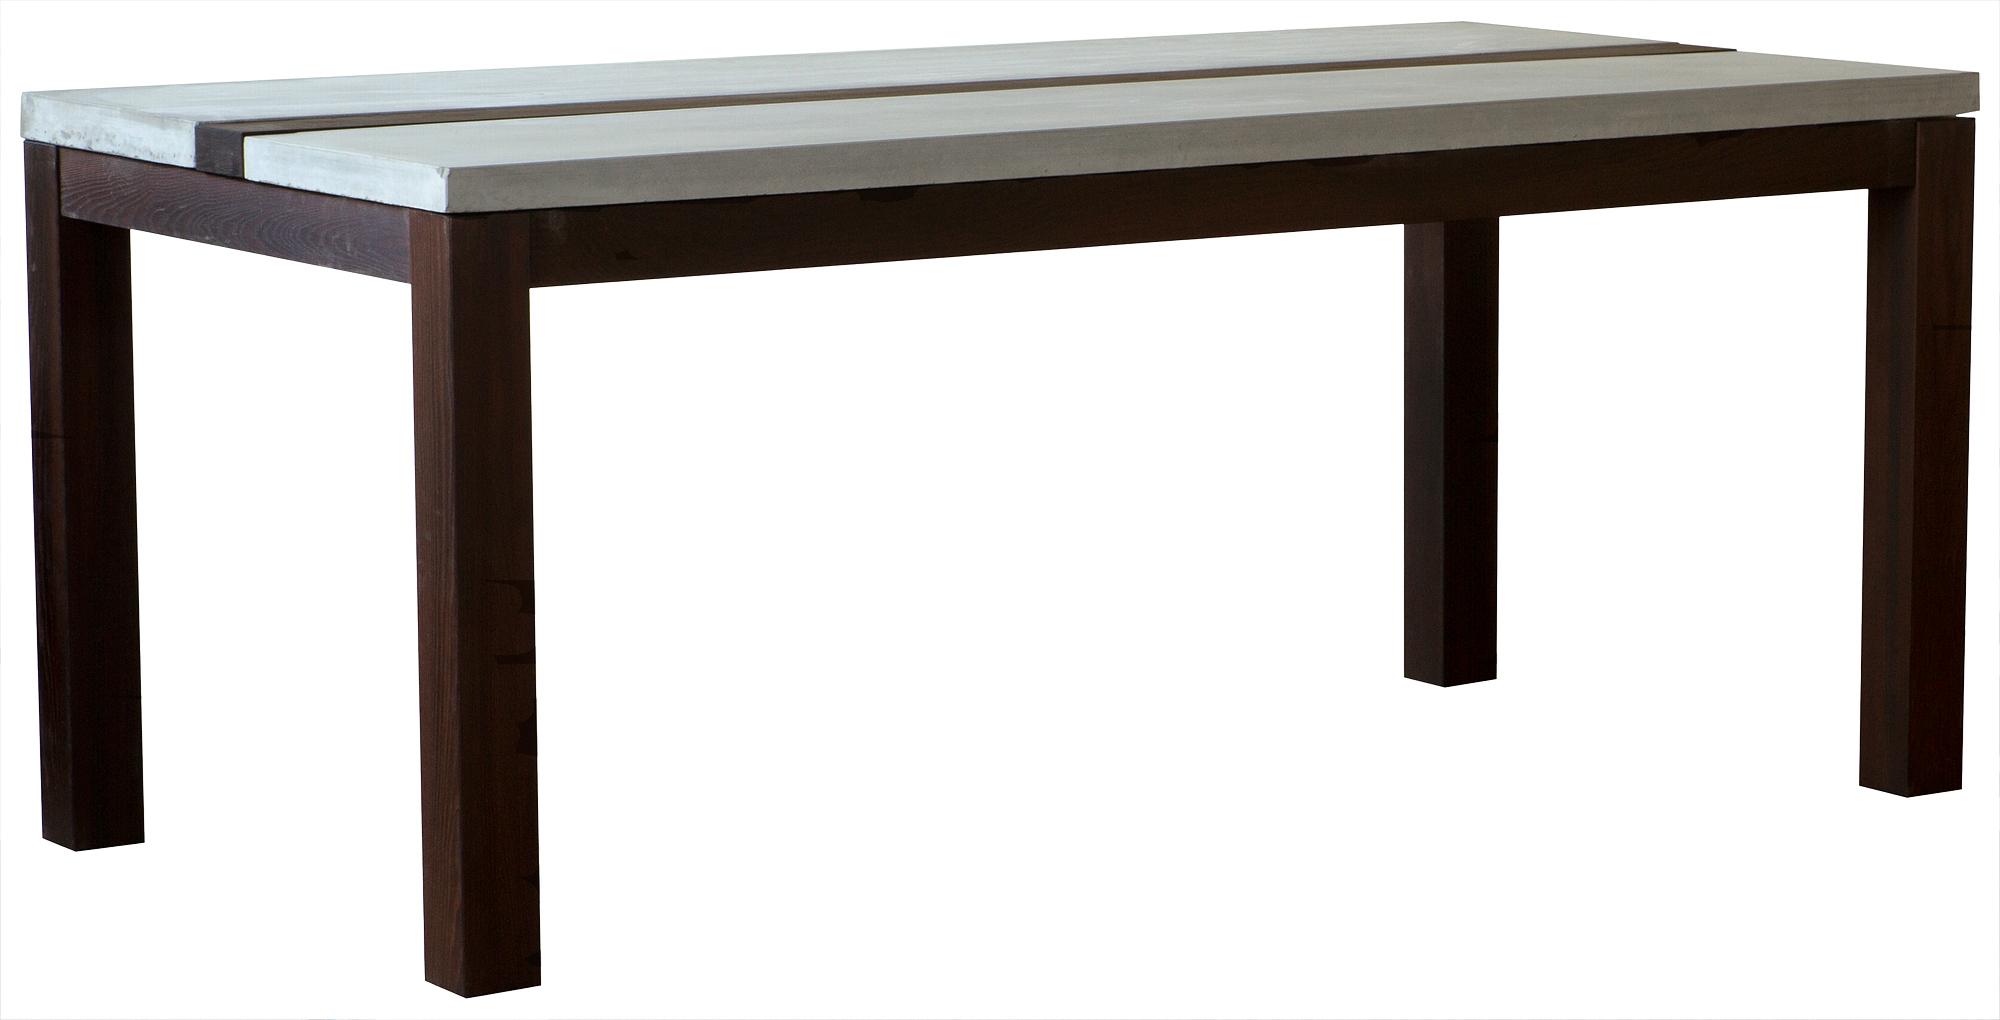 ETON matbord Betong Ask 180cm 5495 kr Trendrum se